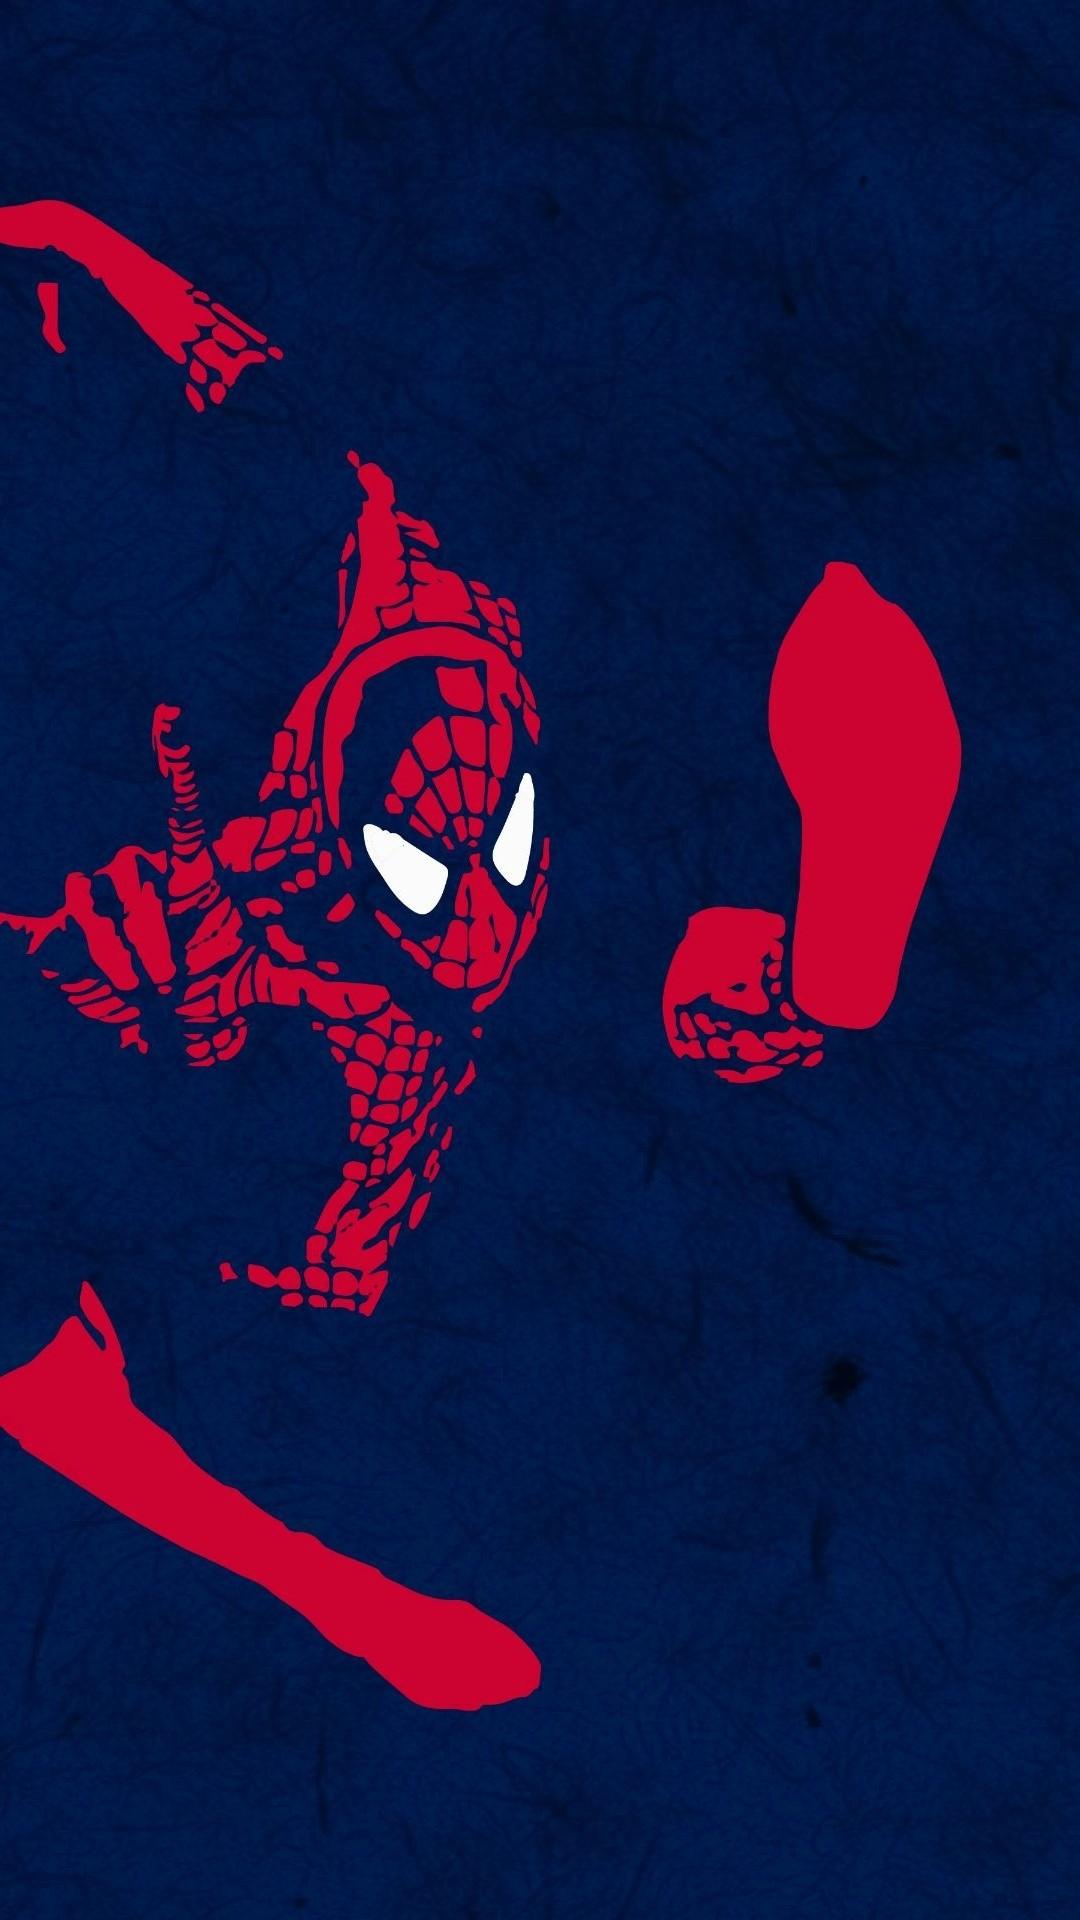 Spider man comic wallpaper 63 images - Images spiderman ...